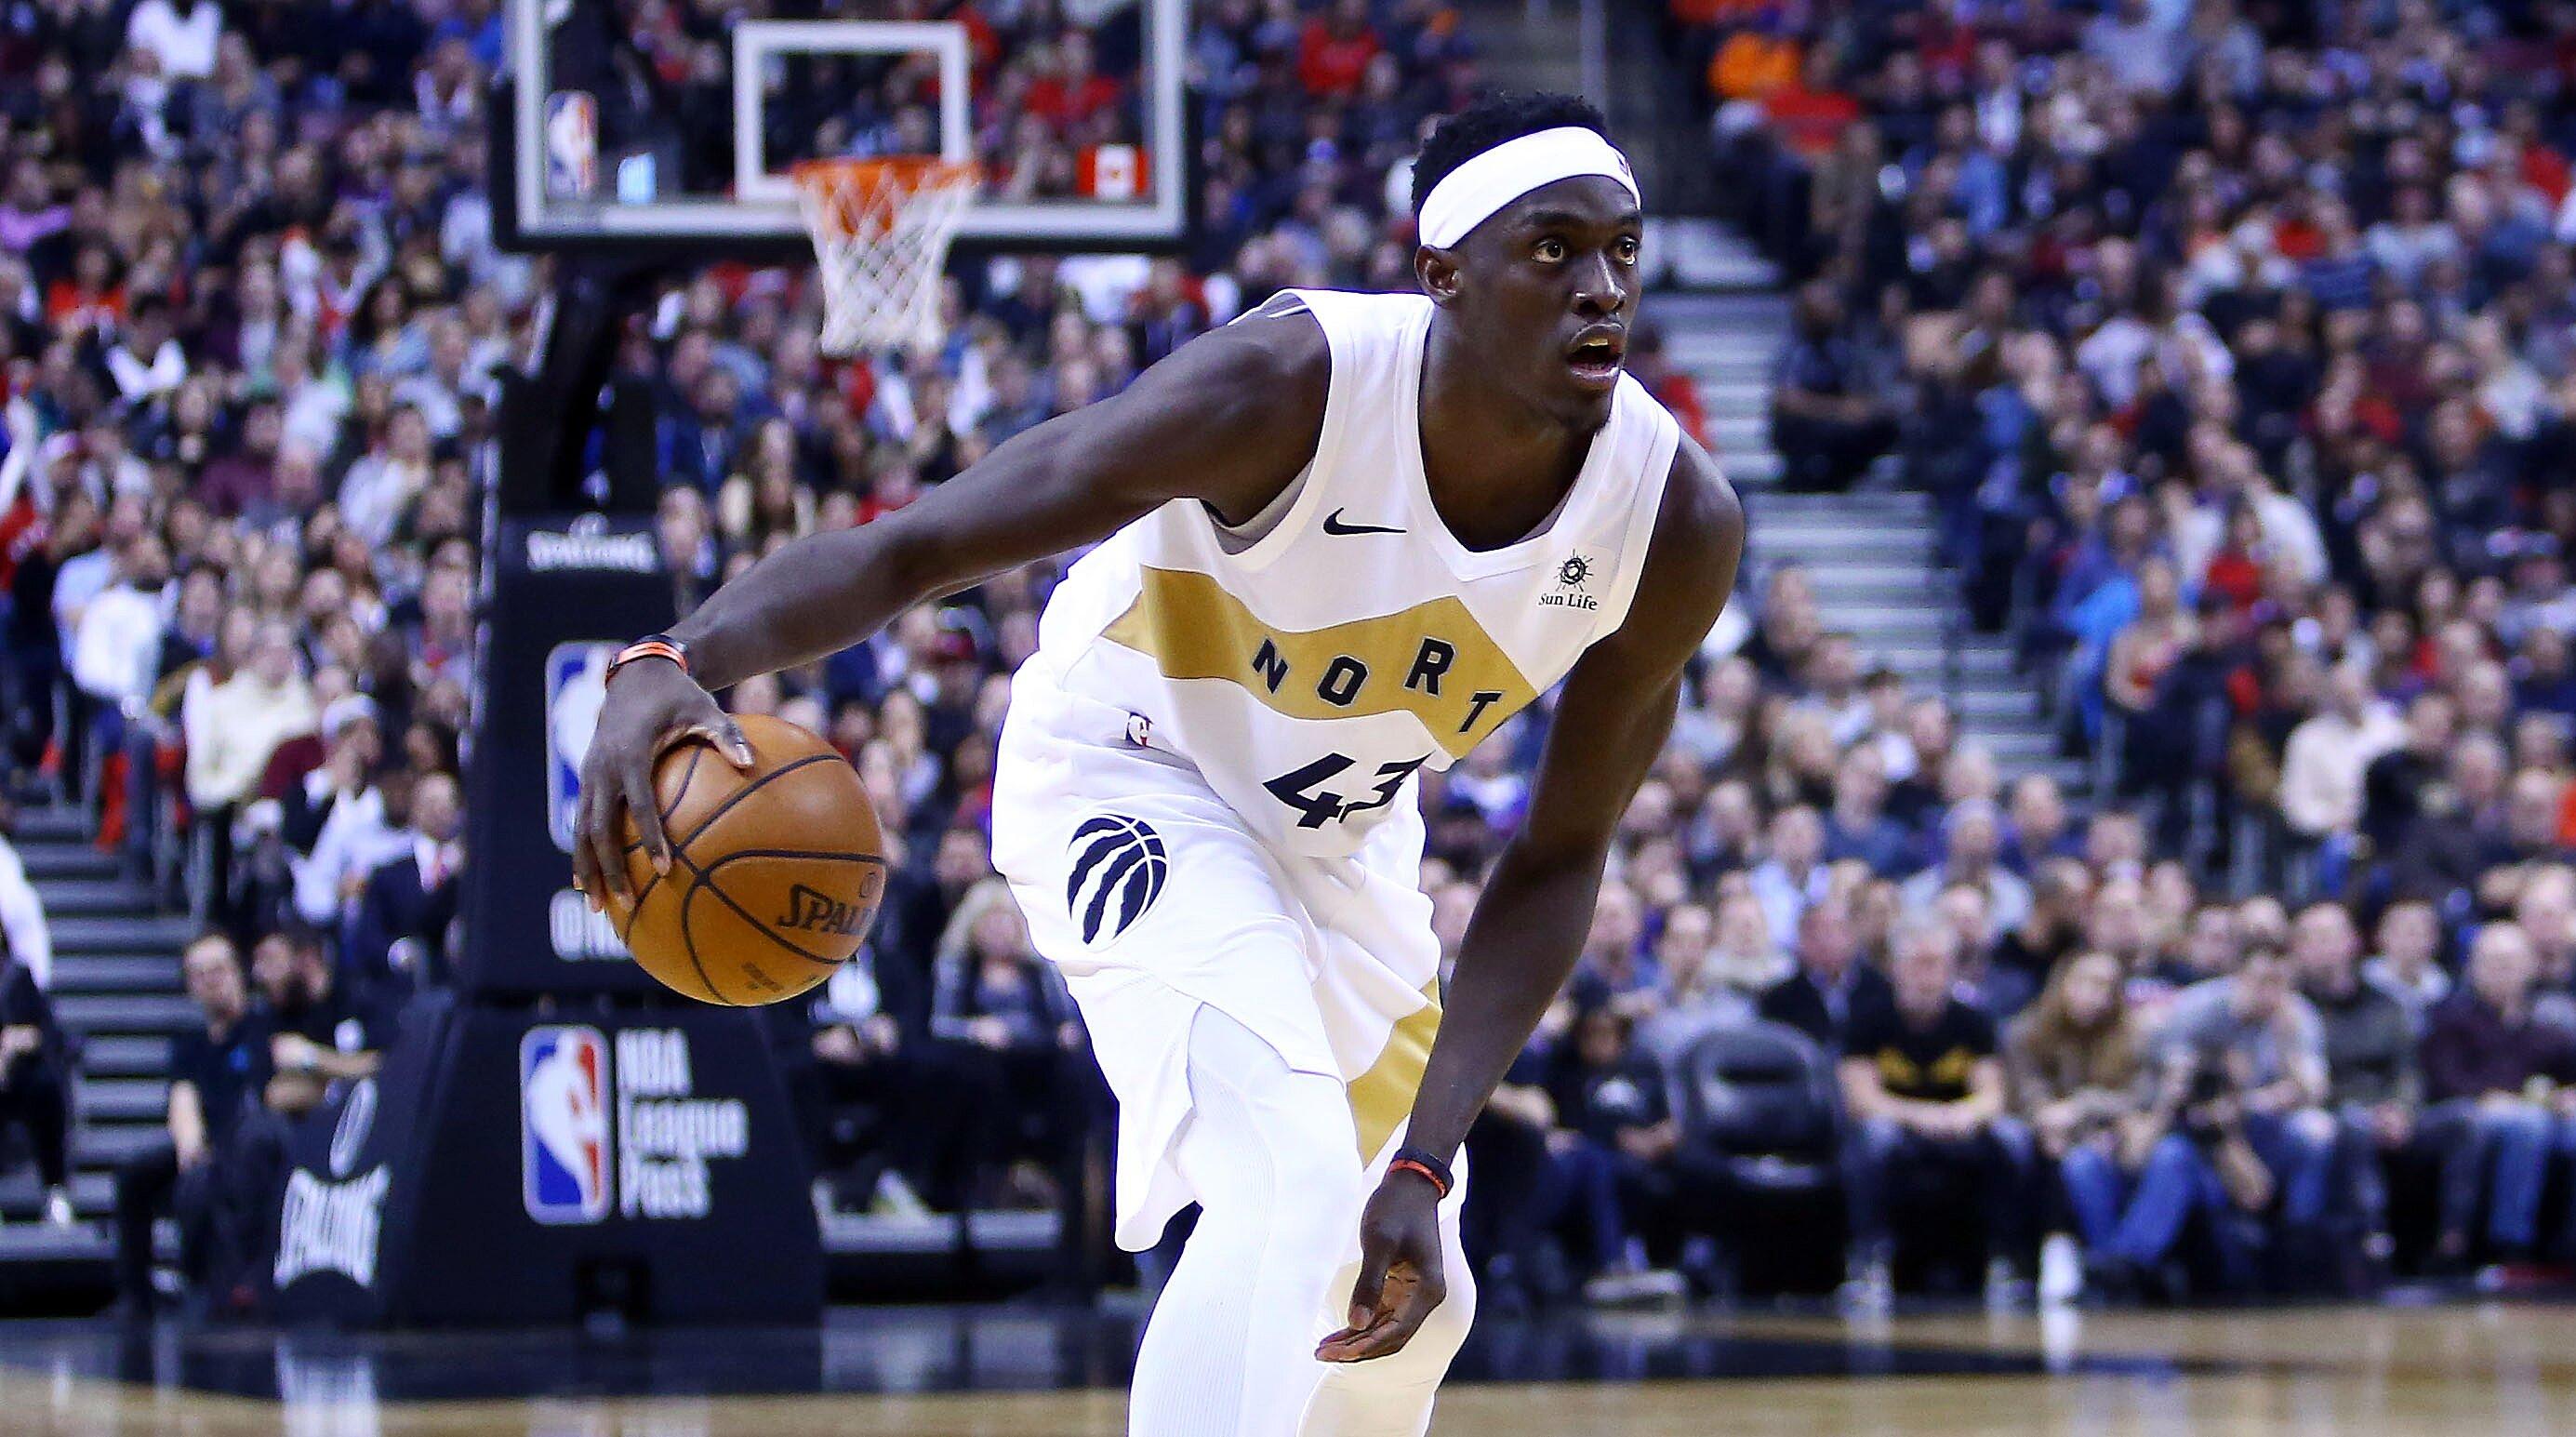 85f3a05326c 2019 NBA Awards  Giannis Antetokounmpo and the Bucks dominate